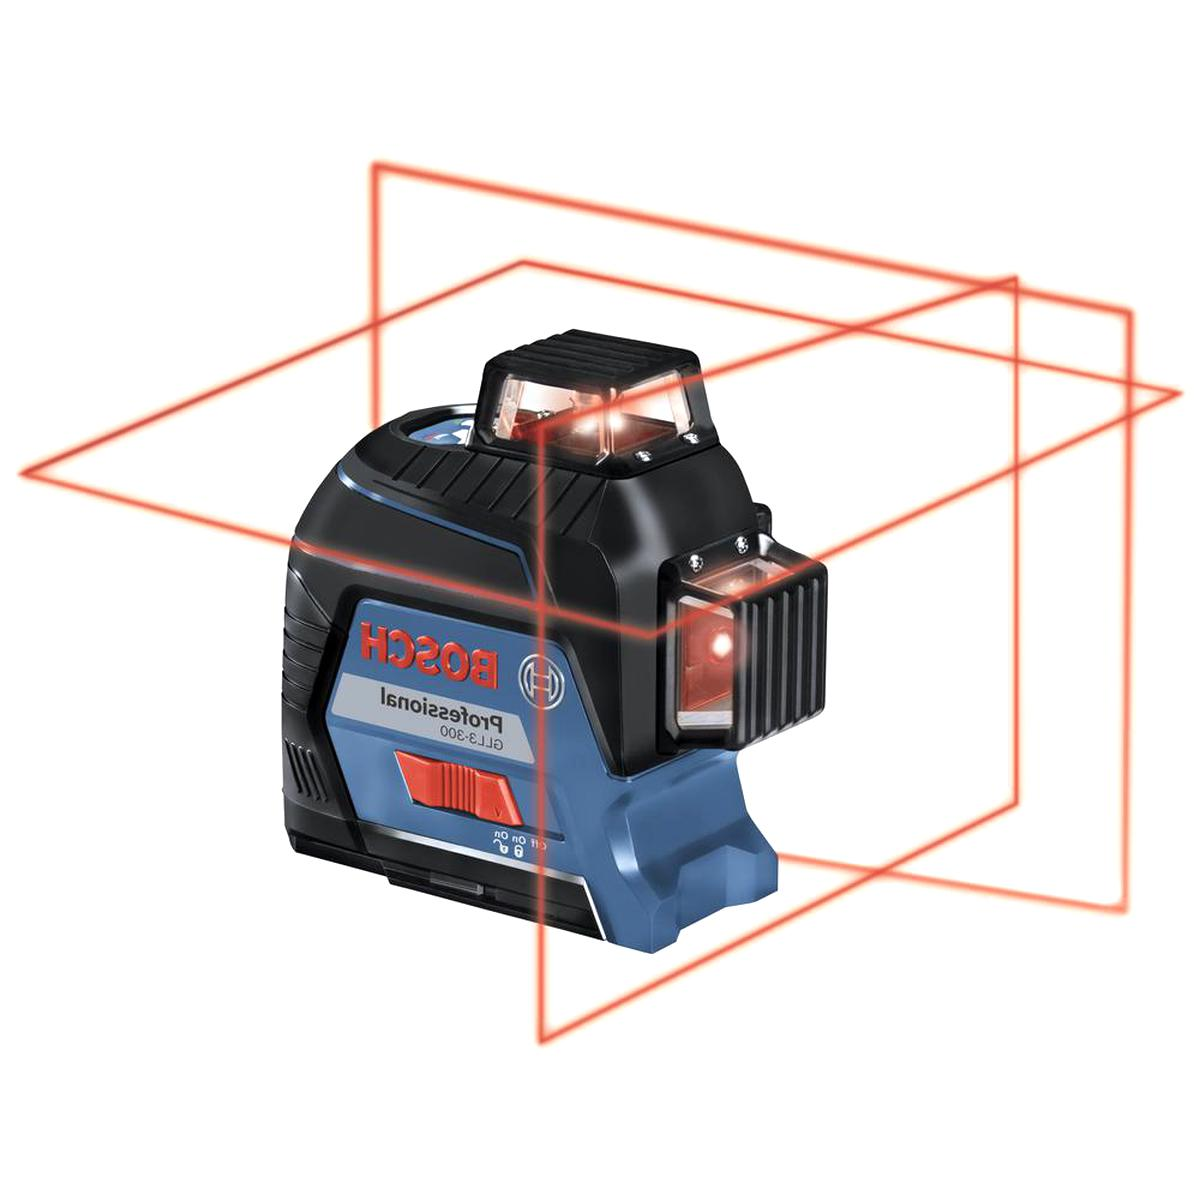 laser bosch niveau gll3 d'occasion